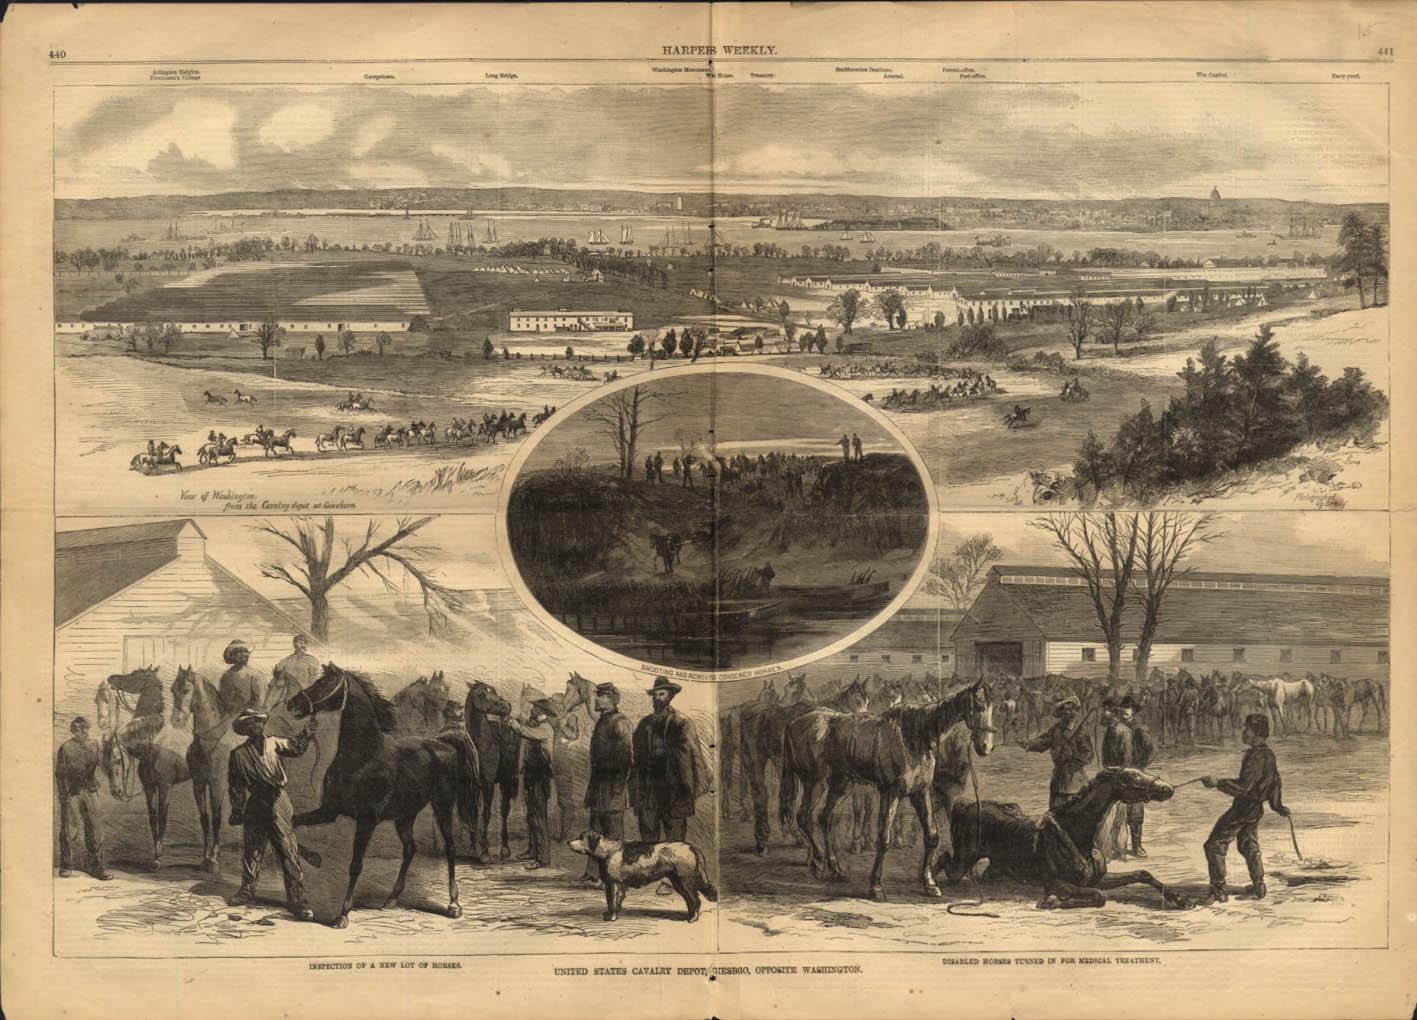 Image for U S Cavalry Depot Giesboro Washington DC Harper's Weekly spread 1865